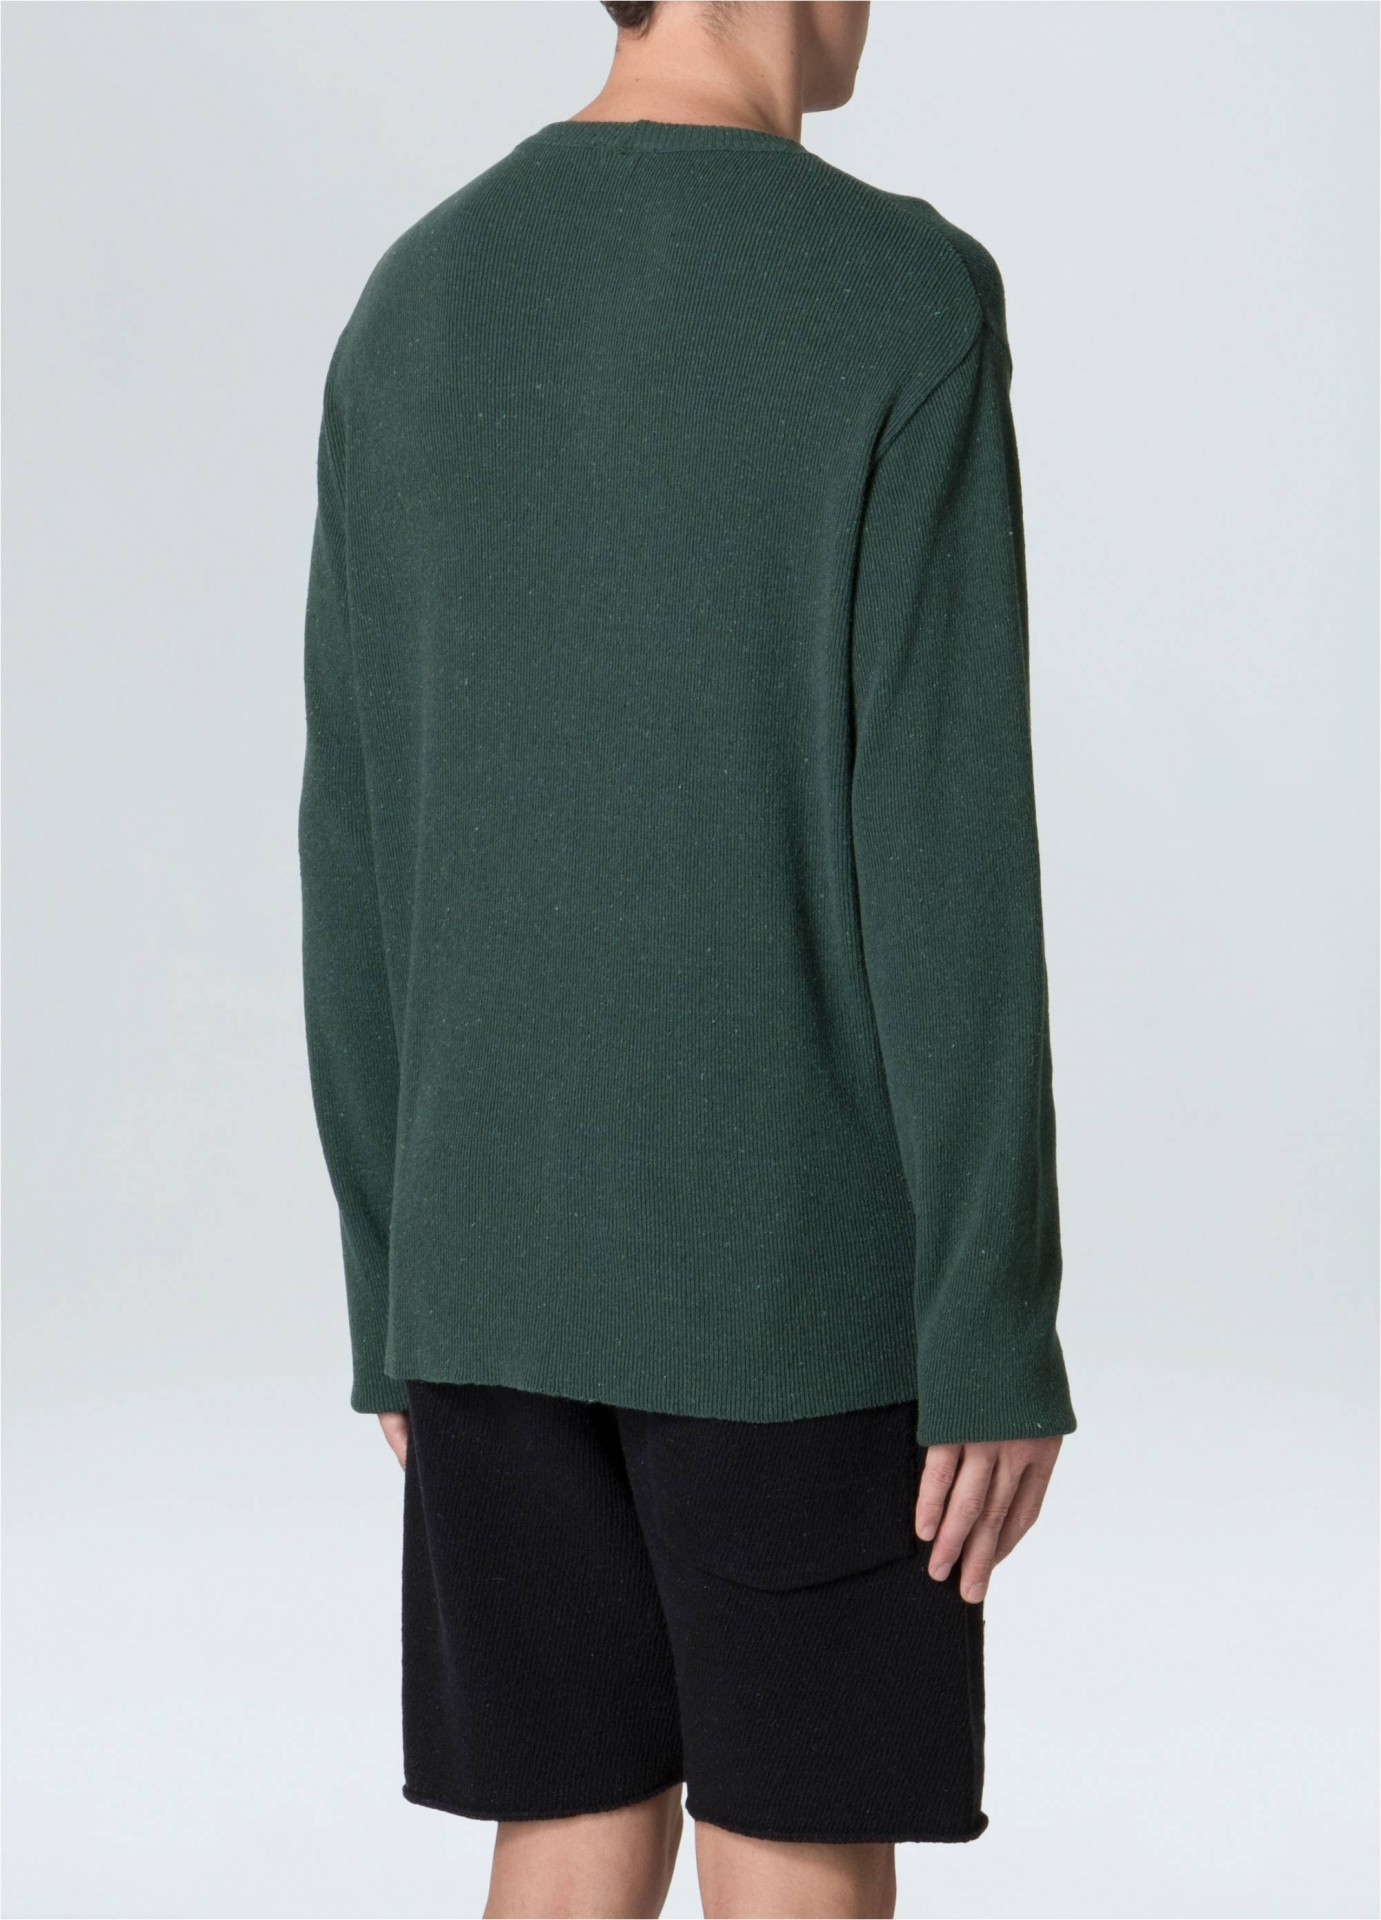 Sweater Masculino Tricot Canelado E-Fabrics